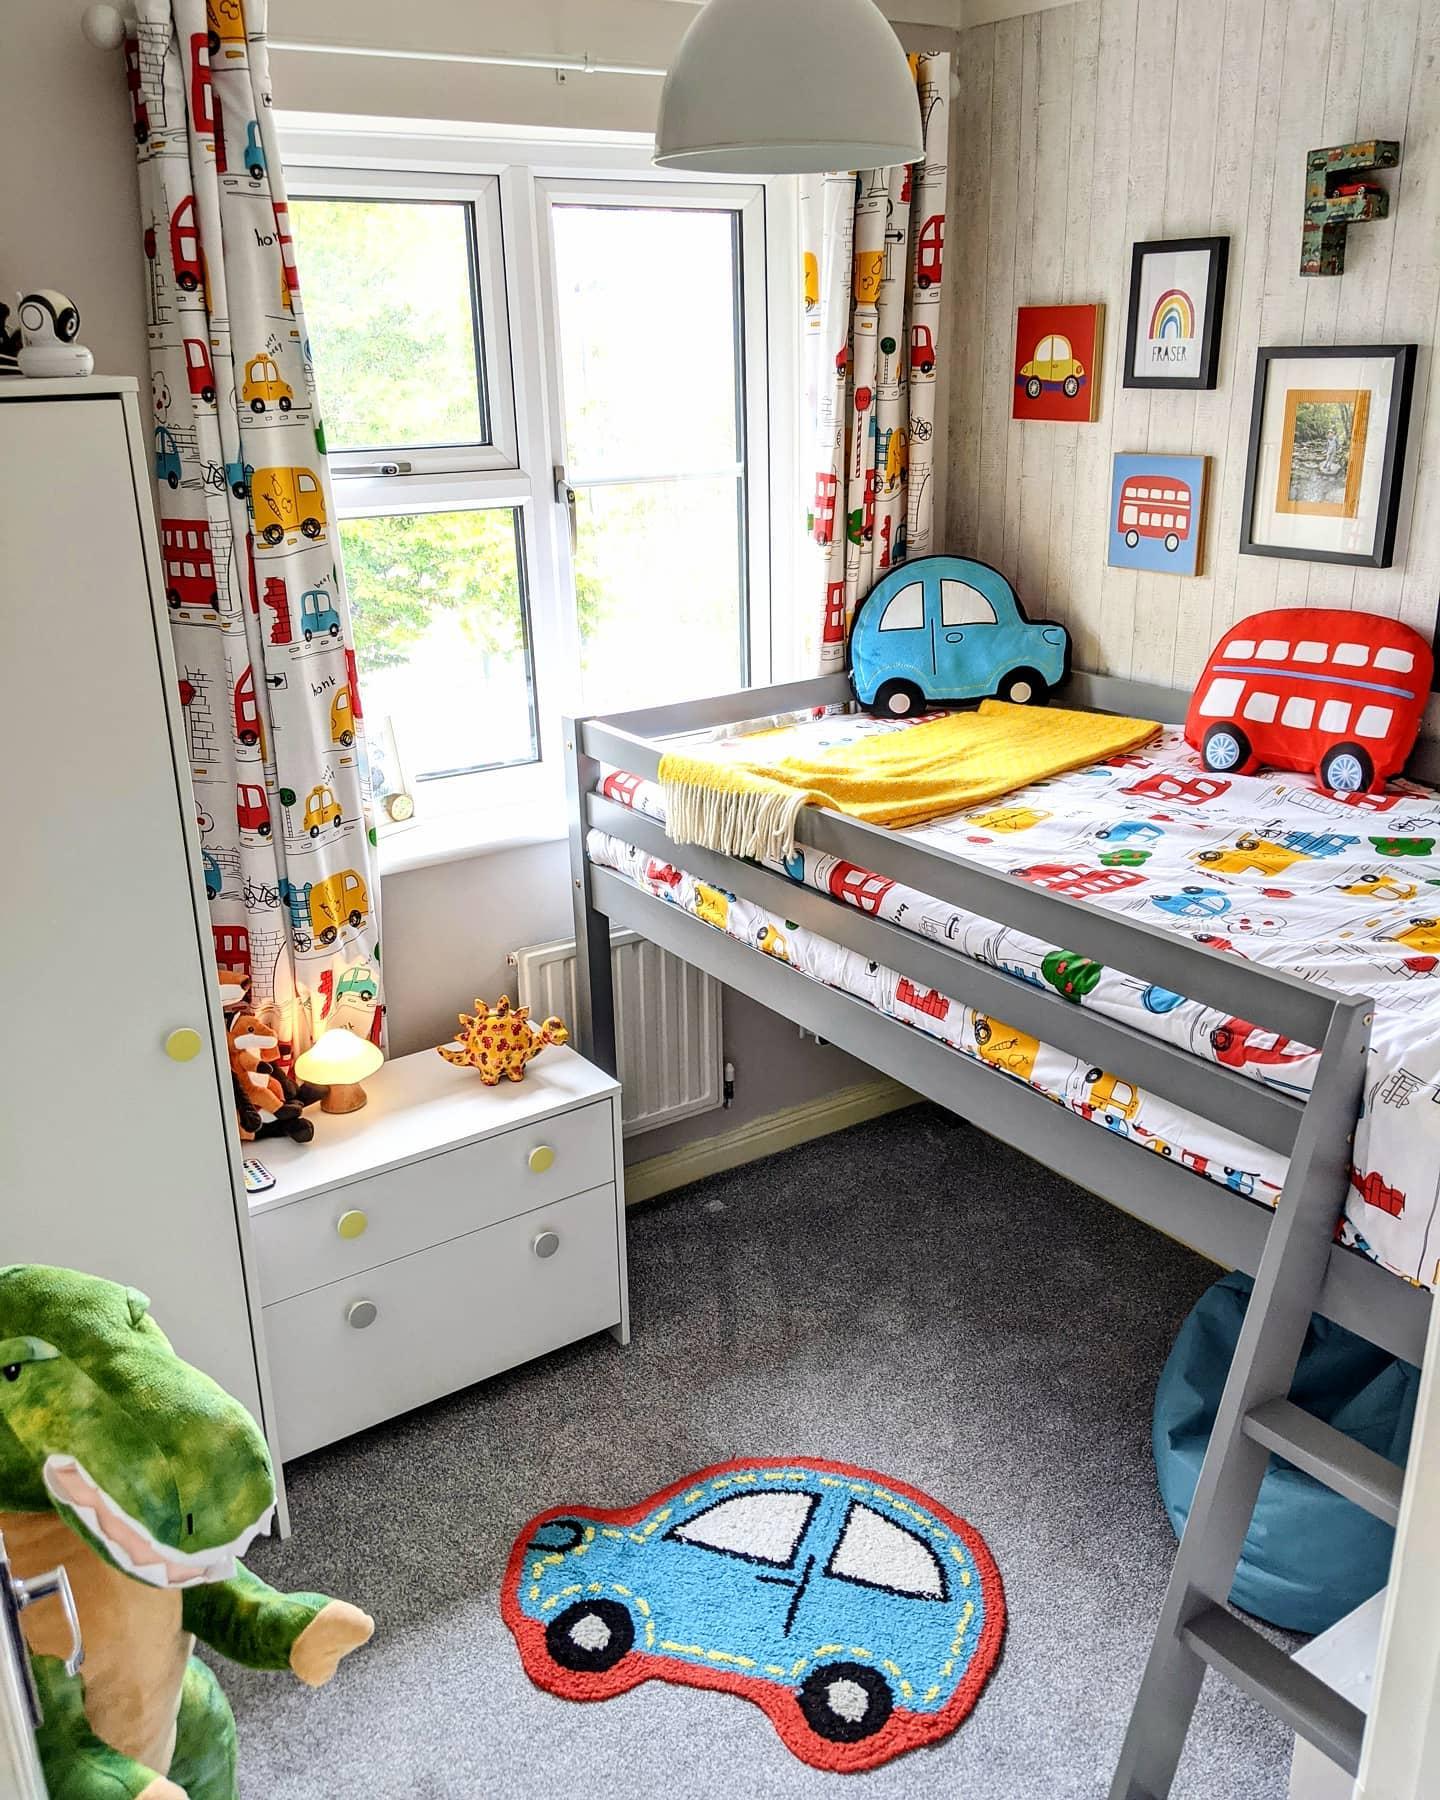 diy-small-room-ideas-mywoodlandhome